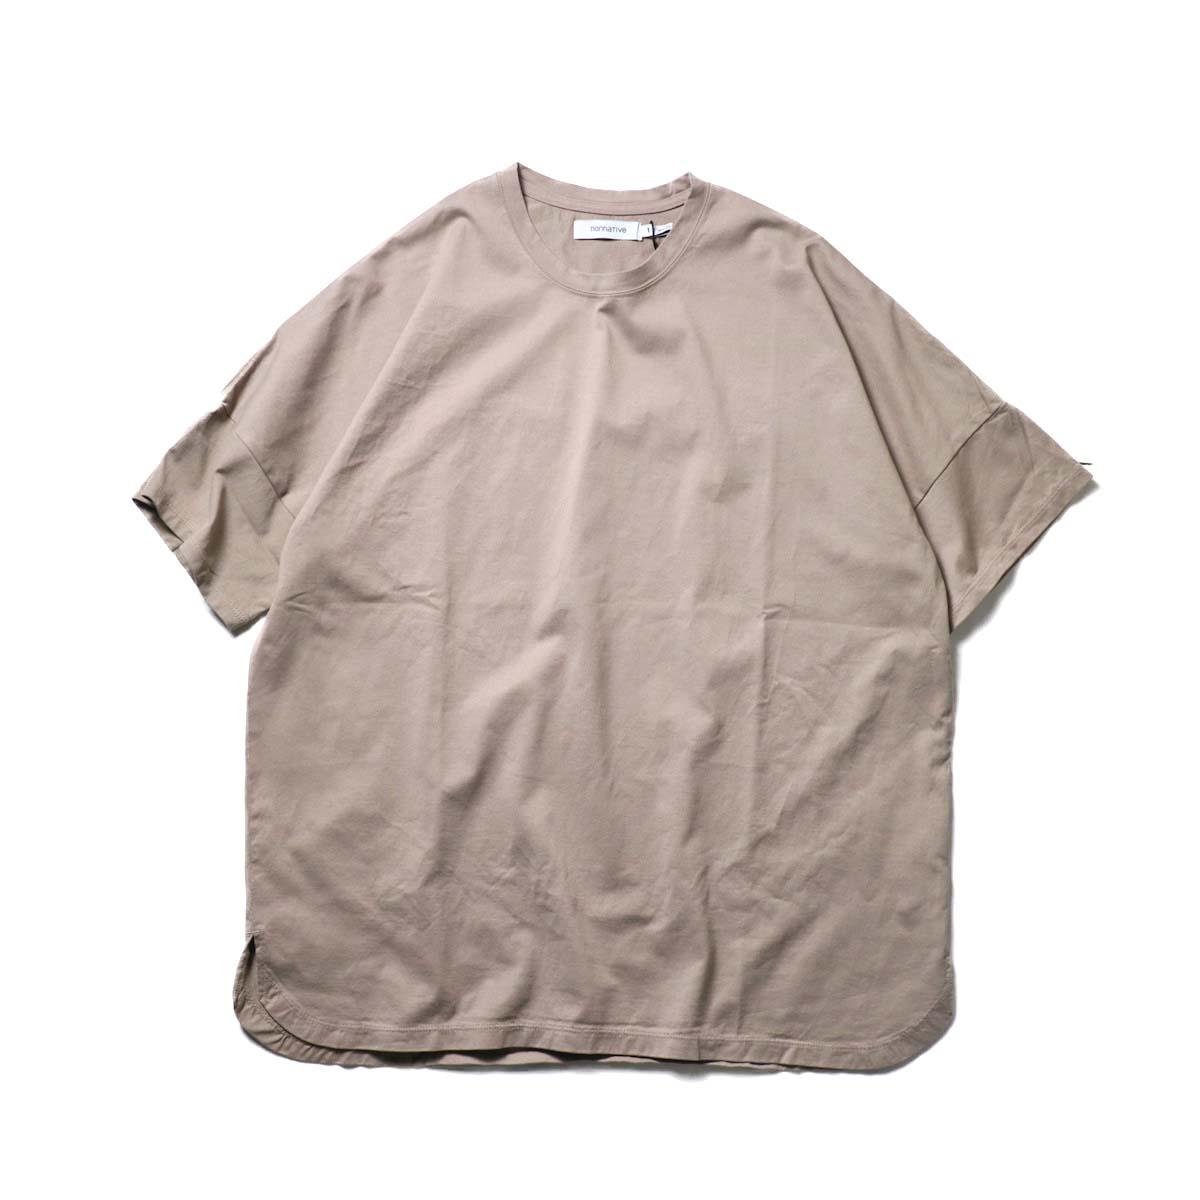 nonnative / CLERK S/S TEE COTTON JERSEY (Mole)正面